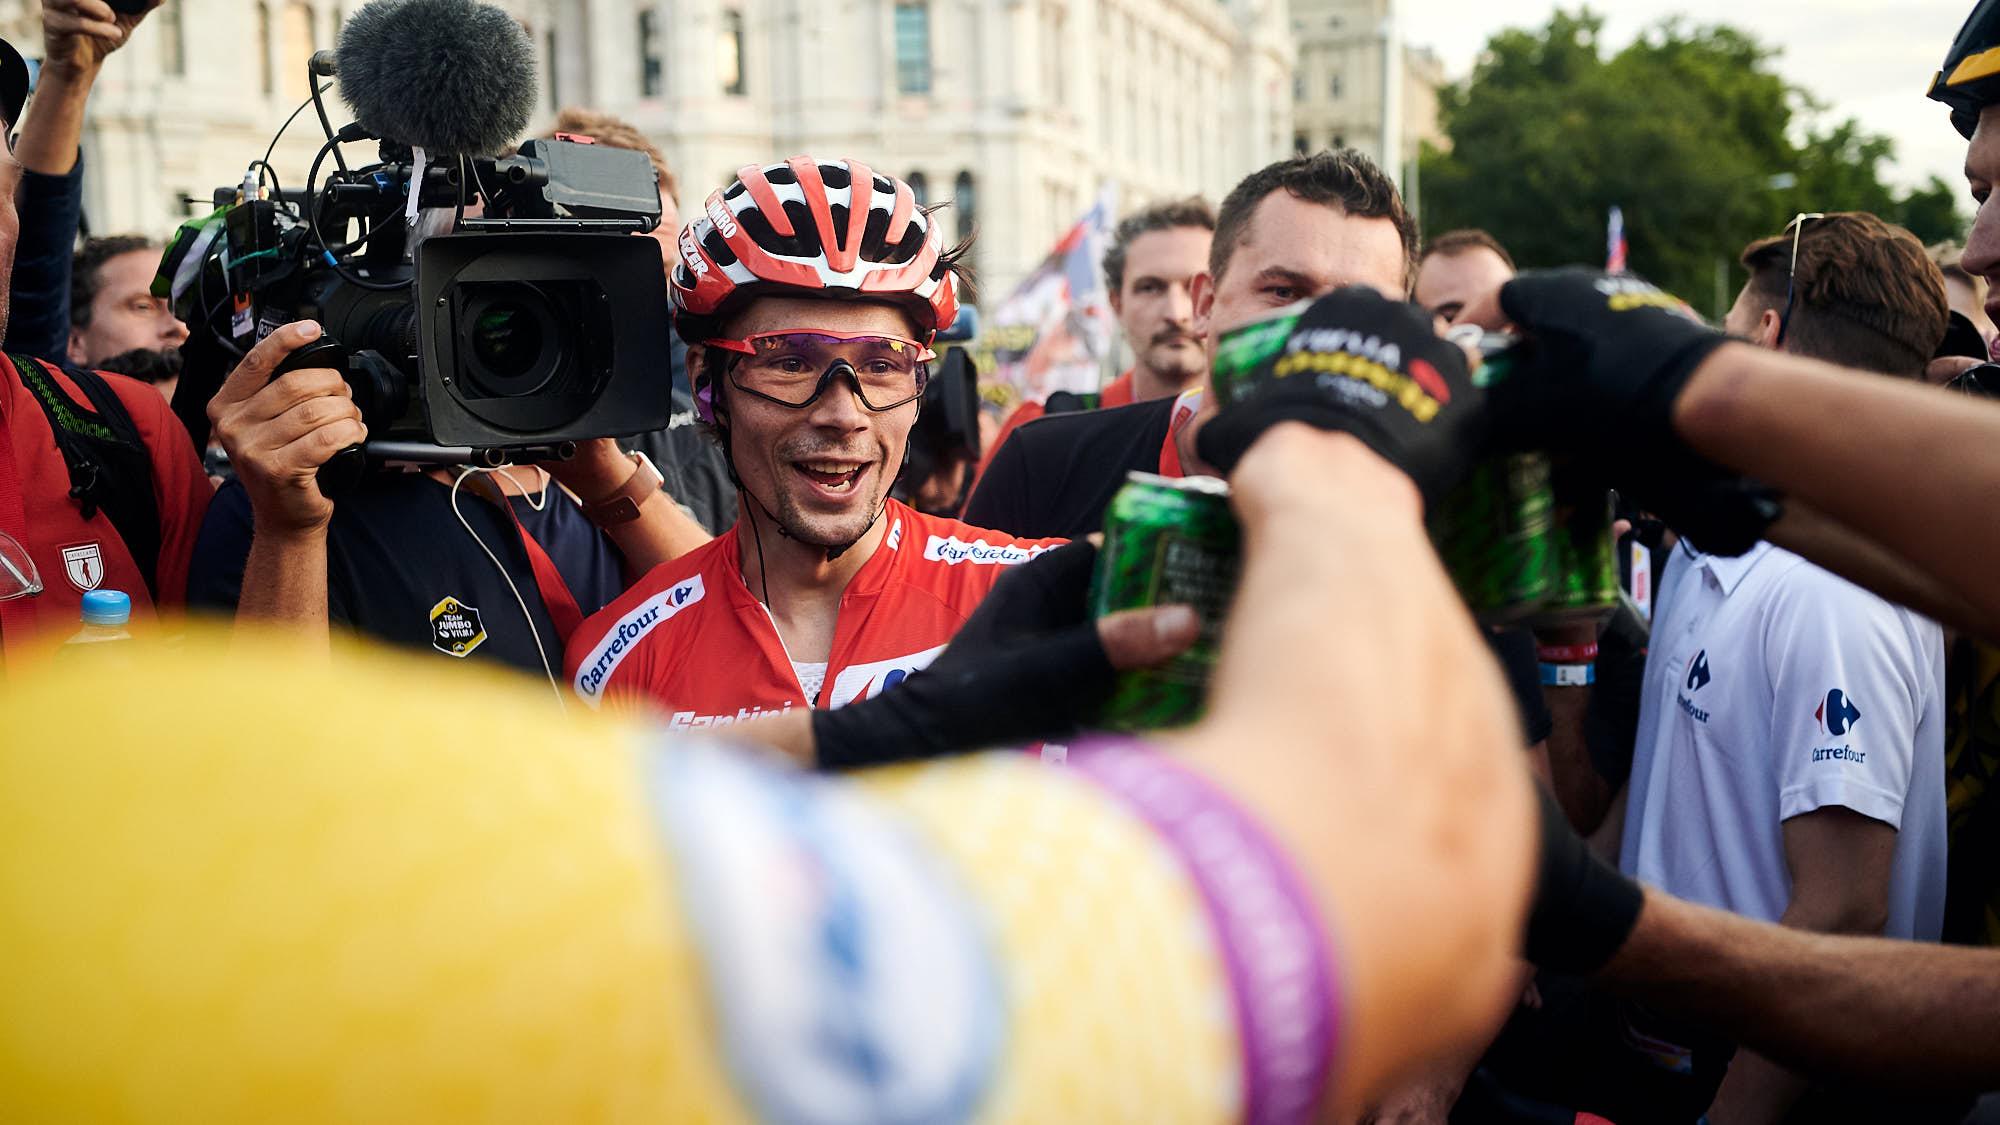 Elite Slovenian cyclist Primoz Roglic celebrating after winning La Vuelta